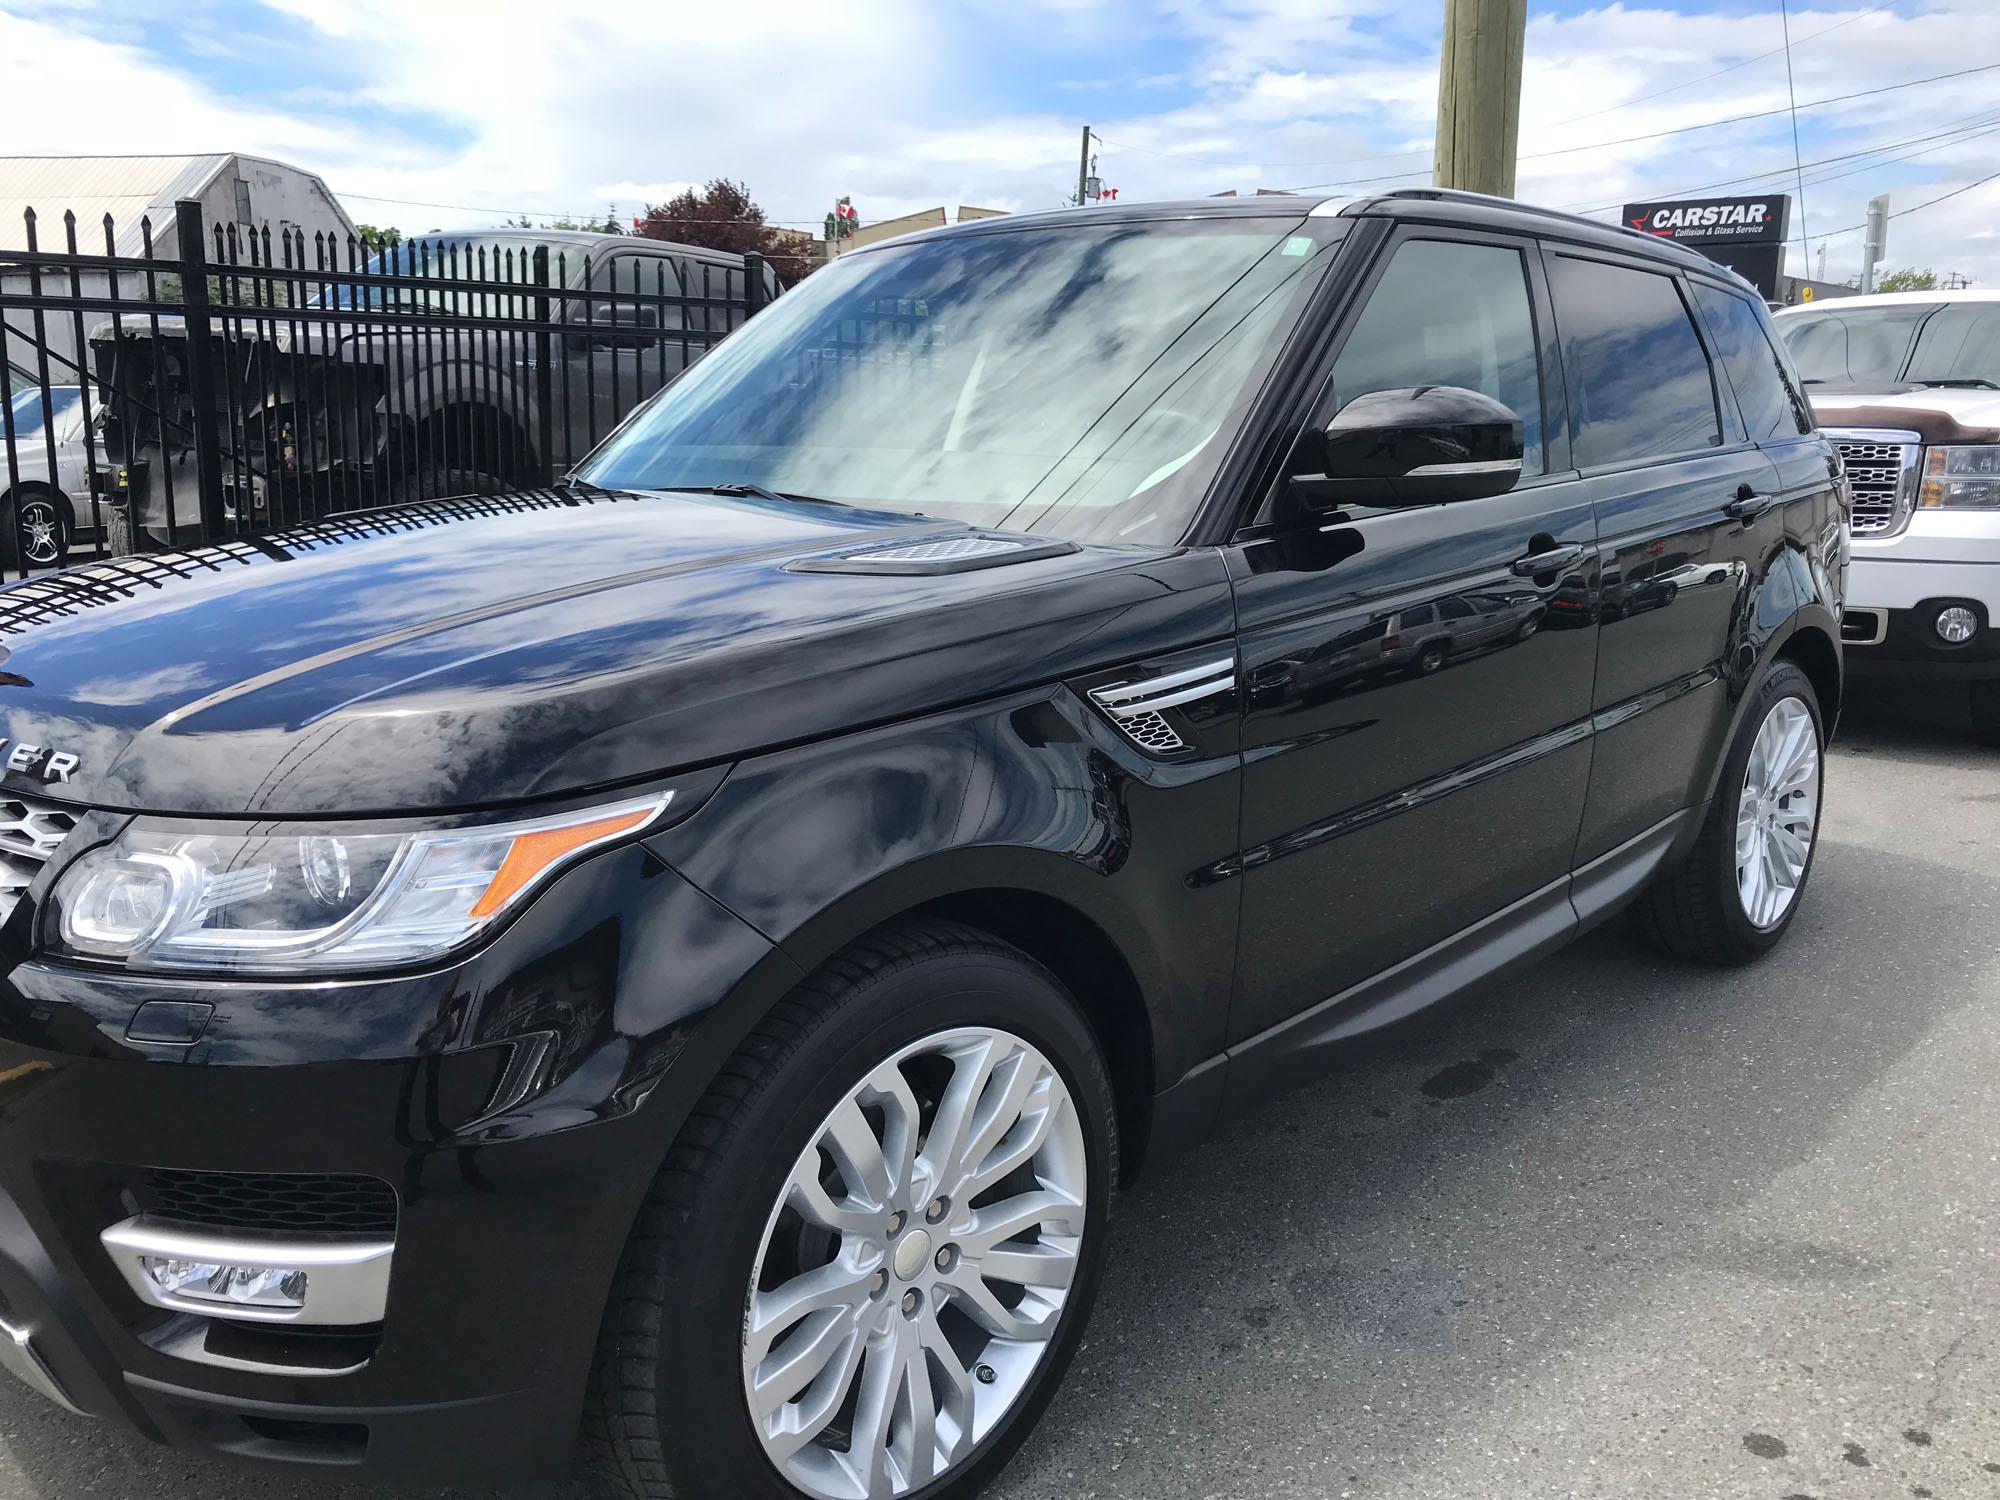 Ian Fergeuson Range Rover Jun 22 2018  (3).jpg